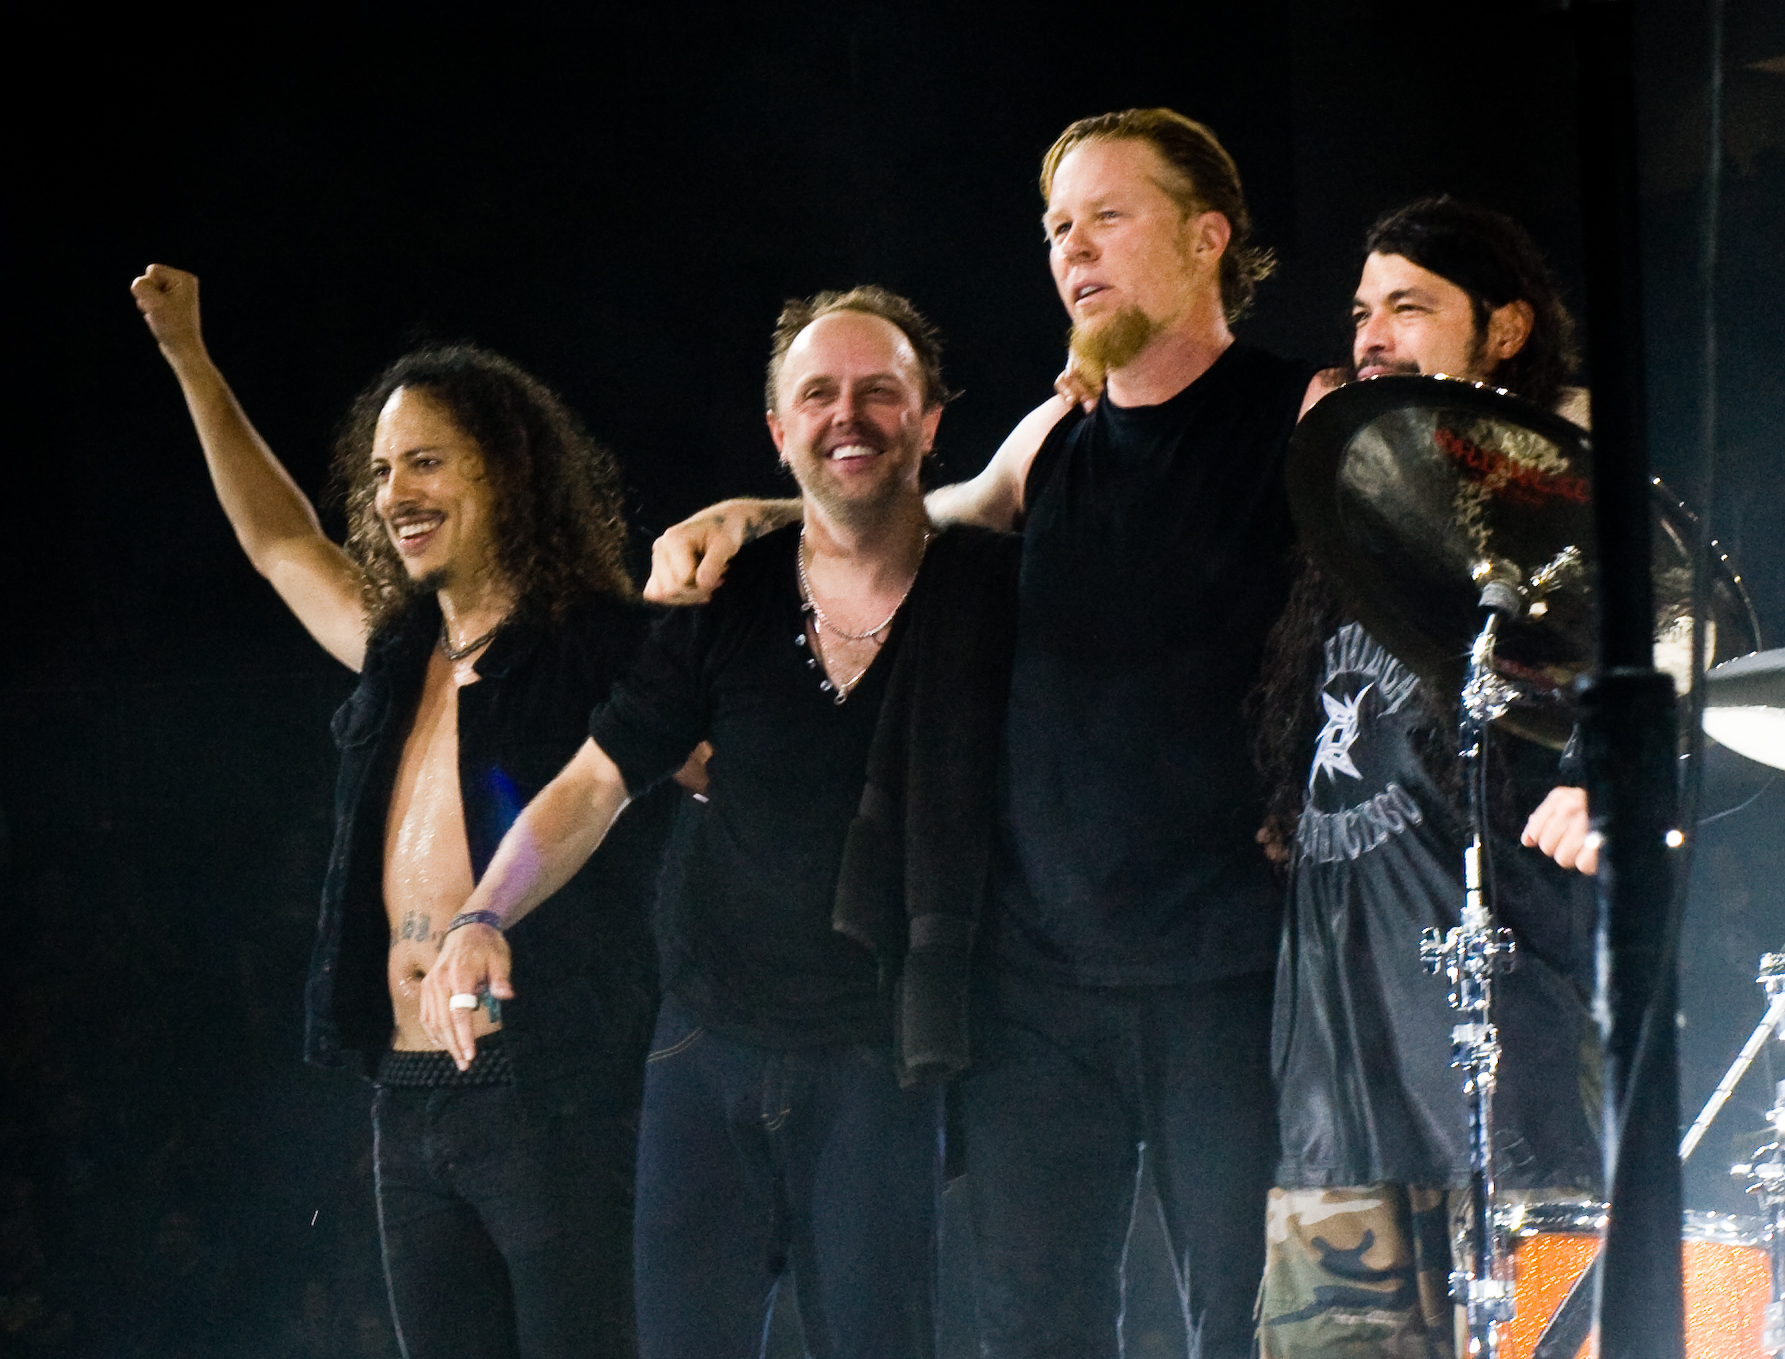 Metallica at The O2 Arena London 2008